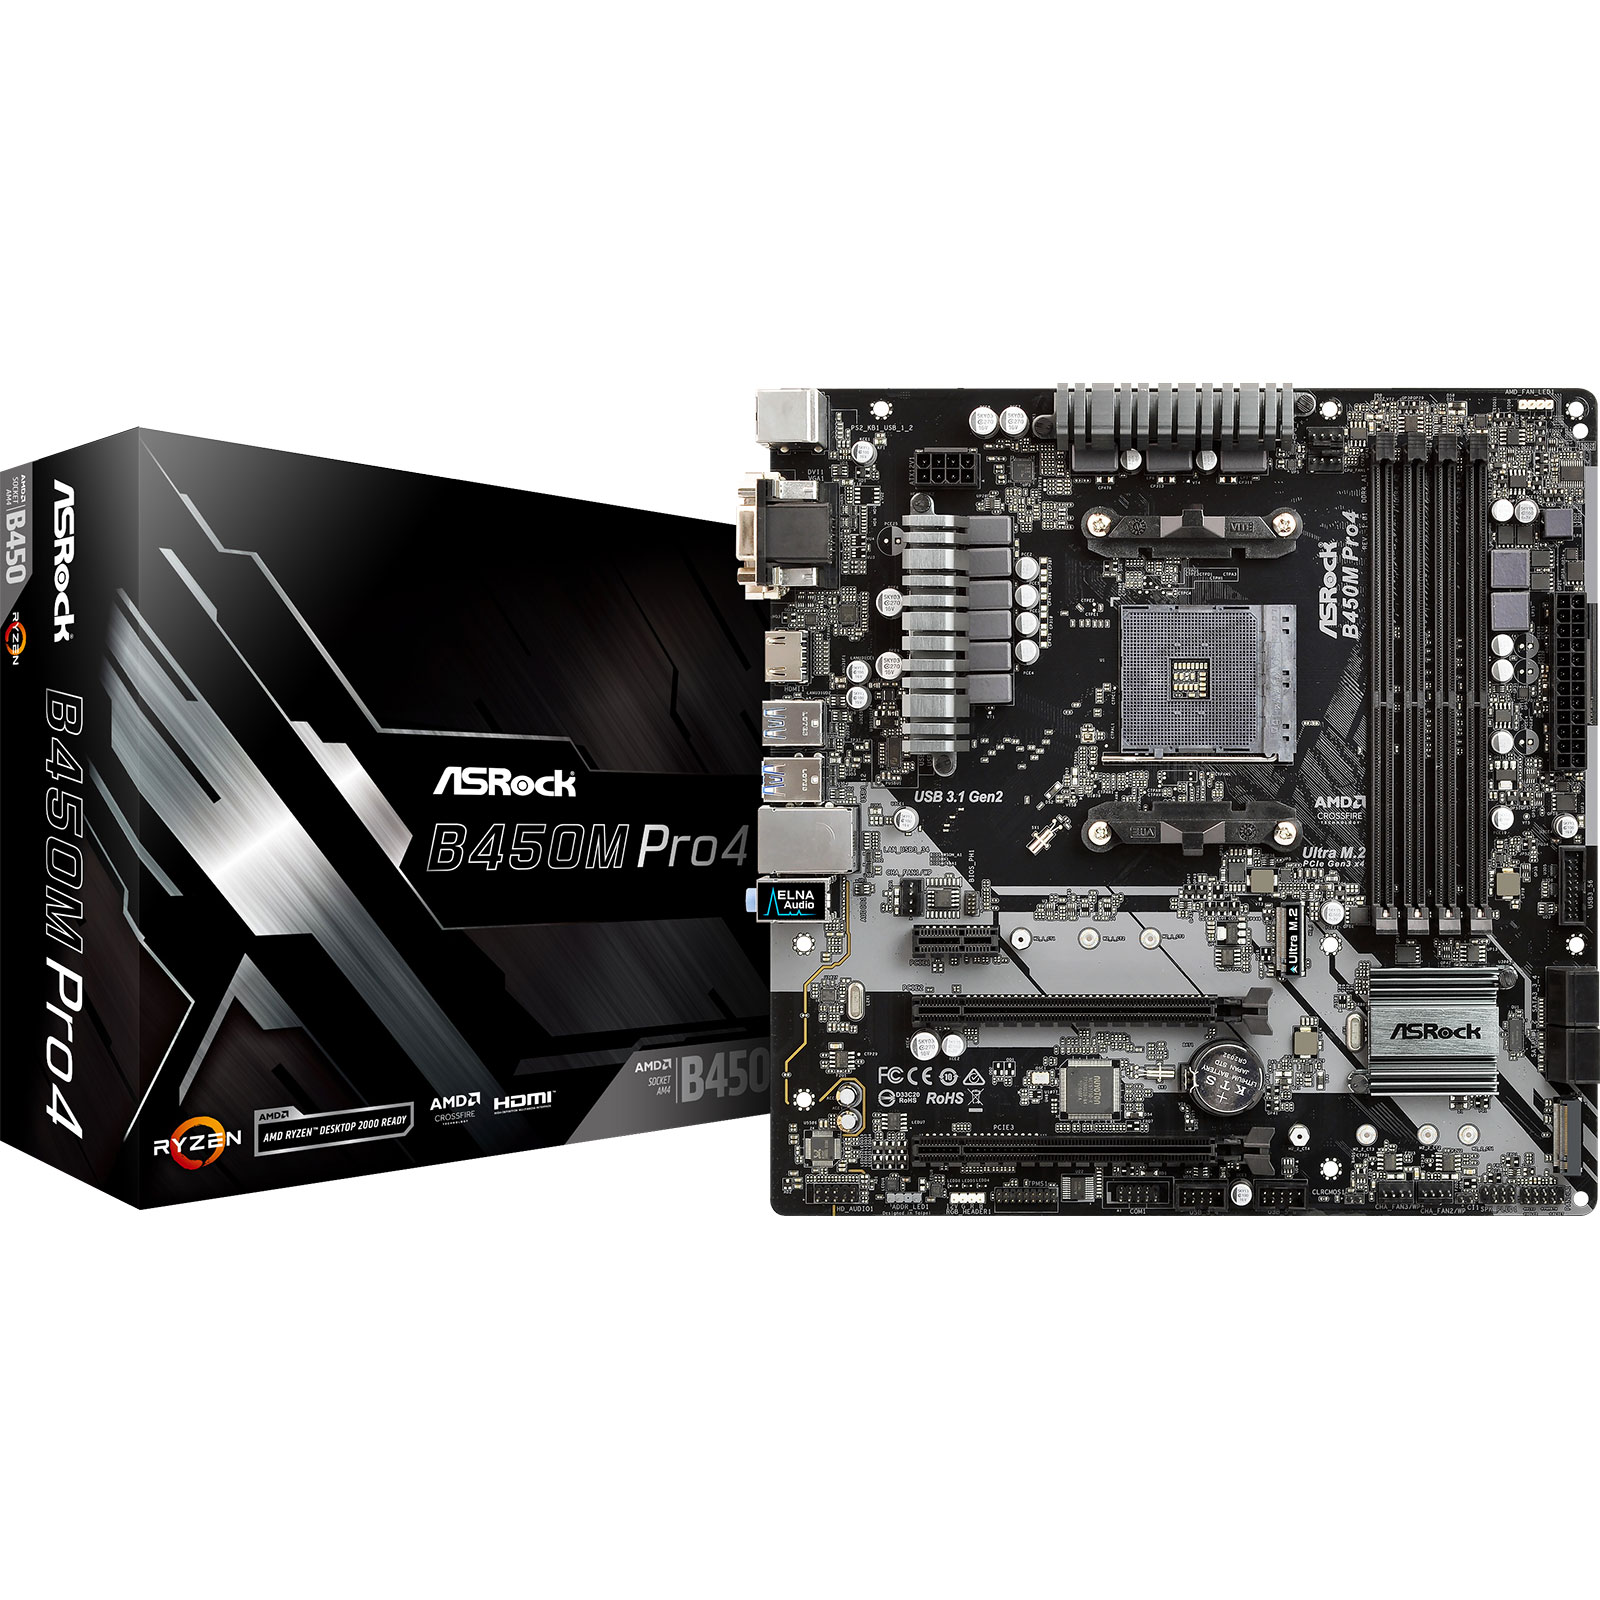 Carte mère ASRock B450M-Pro 4 Carte mère micro-ATX Socket AM4 AMD B450 - 4x DDR4 - SATA 6Gb/s + 2x M.2 - USB 3.1 - 1x PCI-Express 3.0 16x